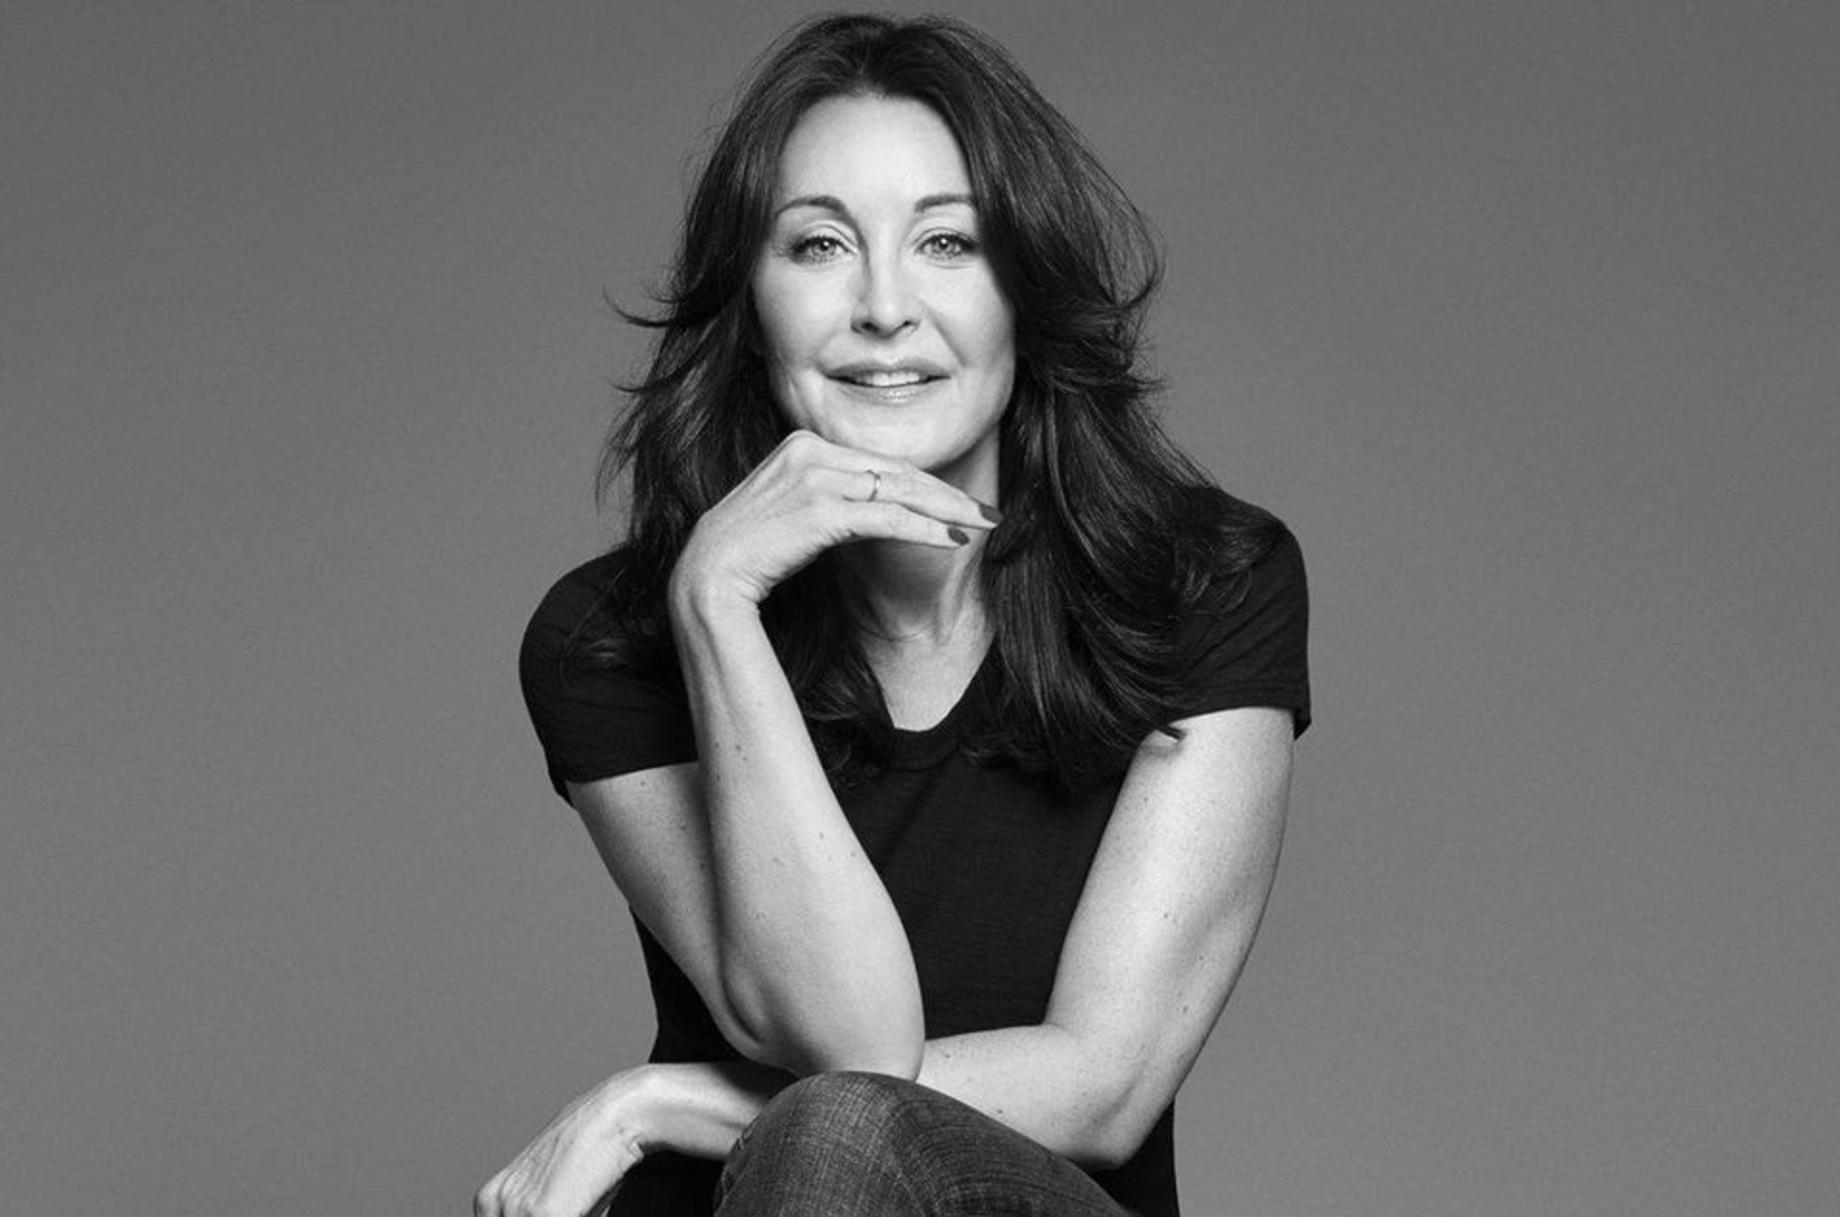 Tamara Mellon Takes the Lead on Women's Equality